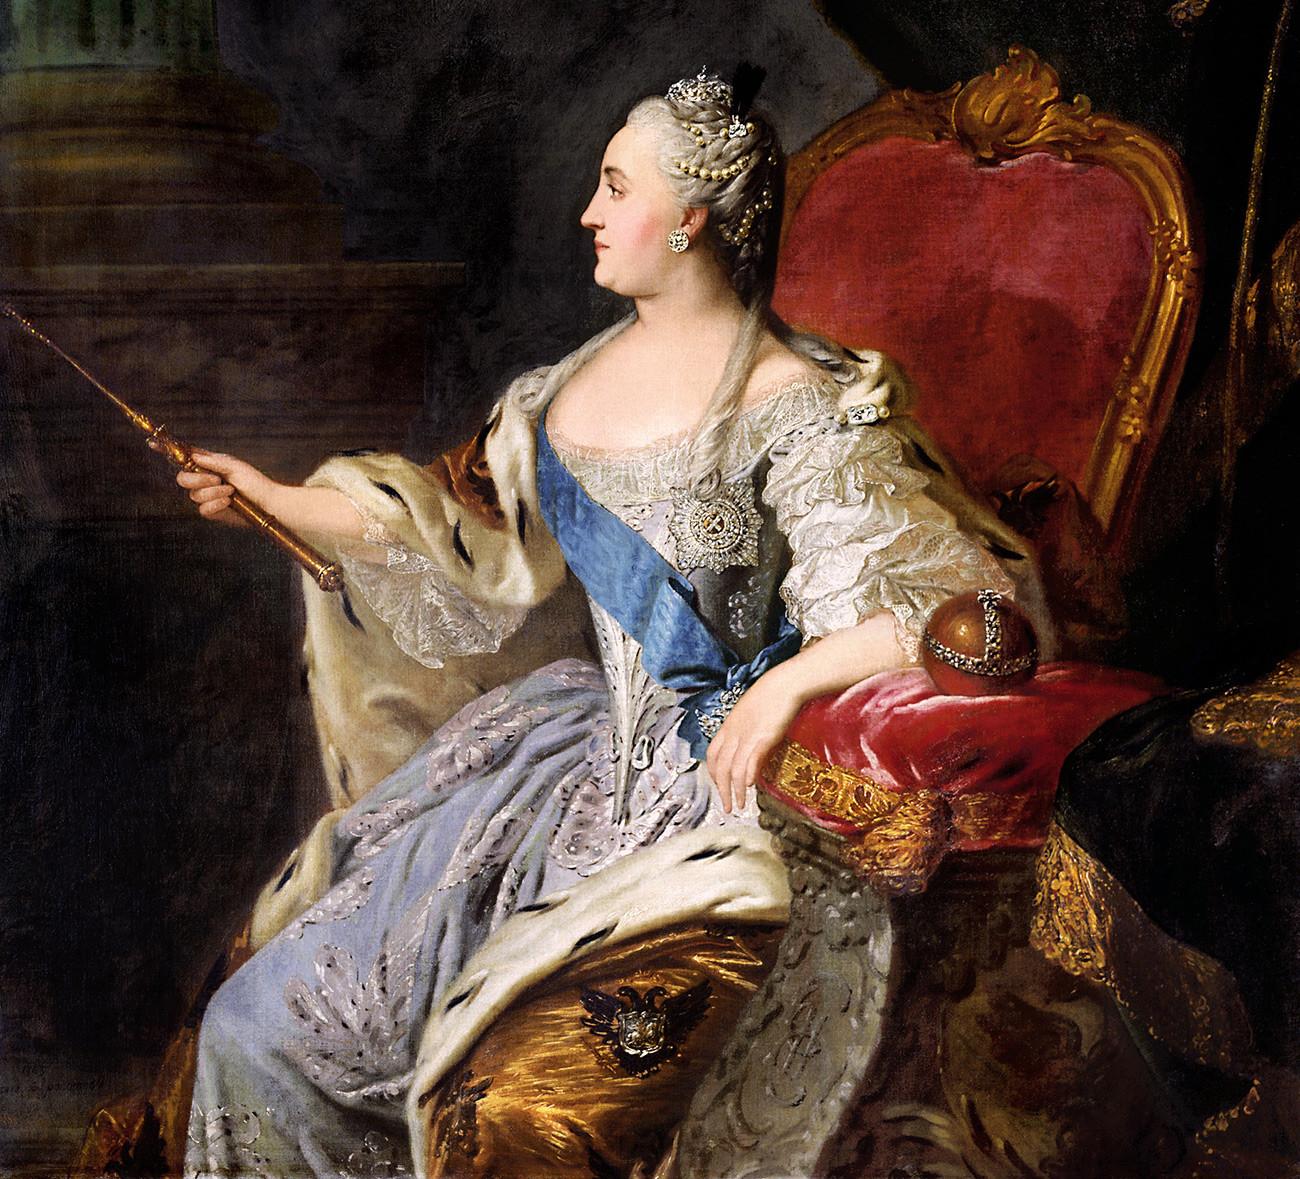 Catherine II, portrait de Fiotor Rokotov